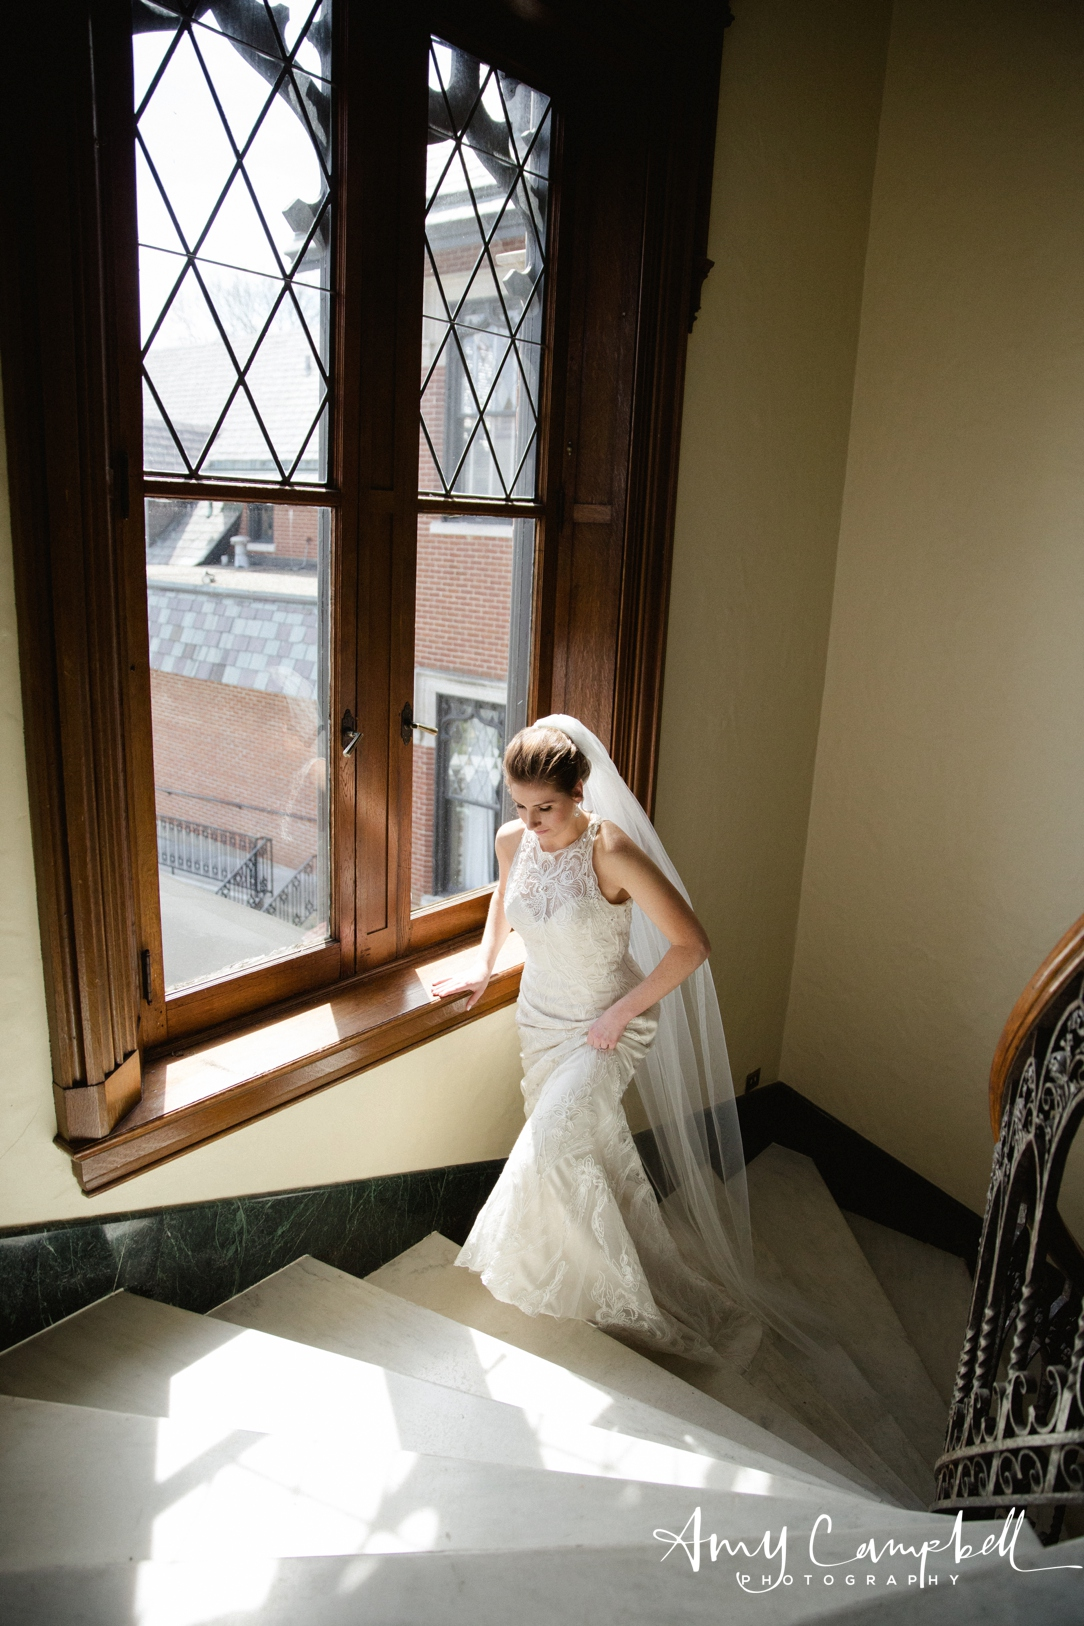 1328_AnnieandMichael_Wedding_AmyCampbellPhotography.jpg